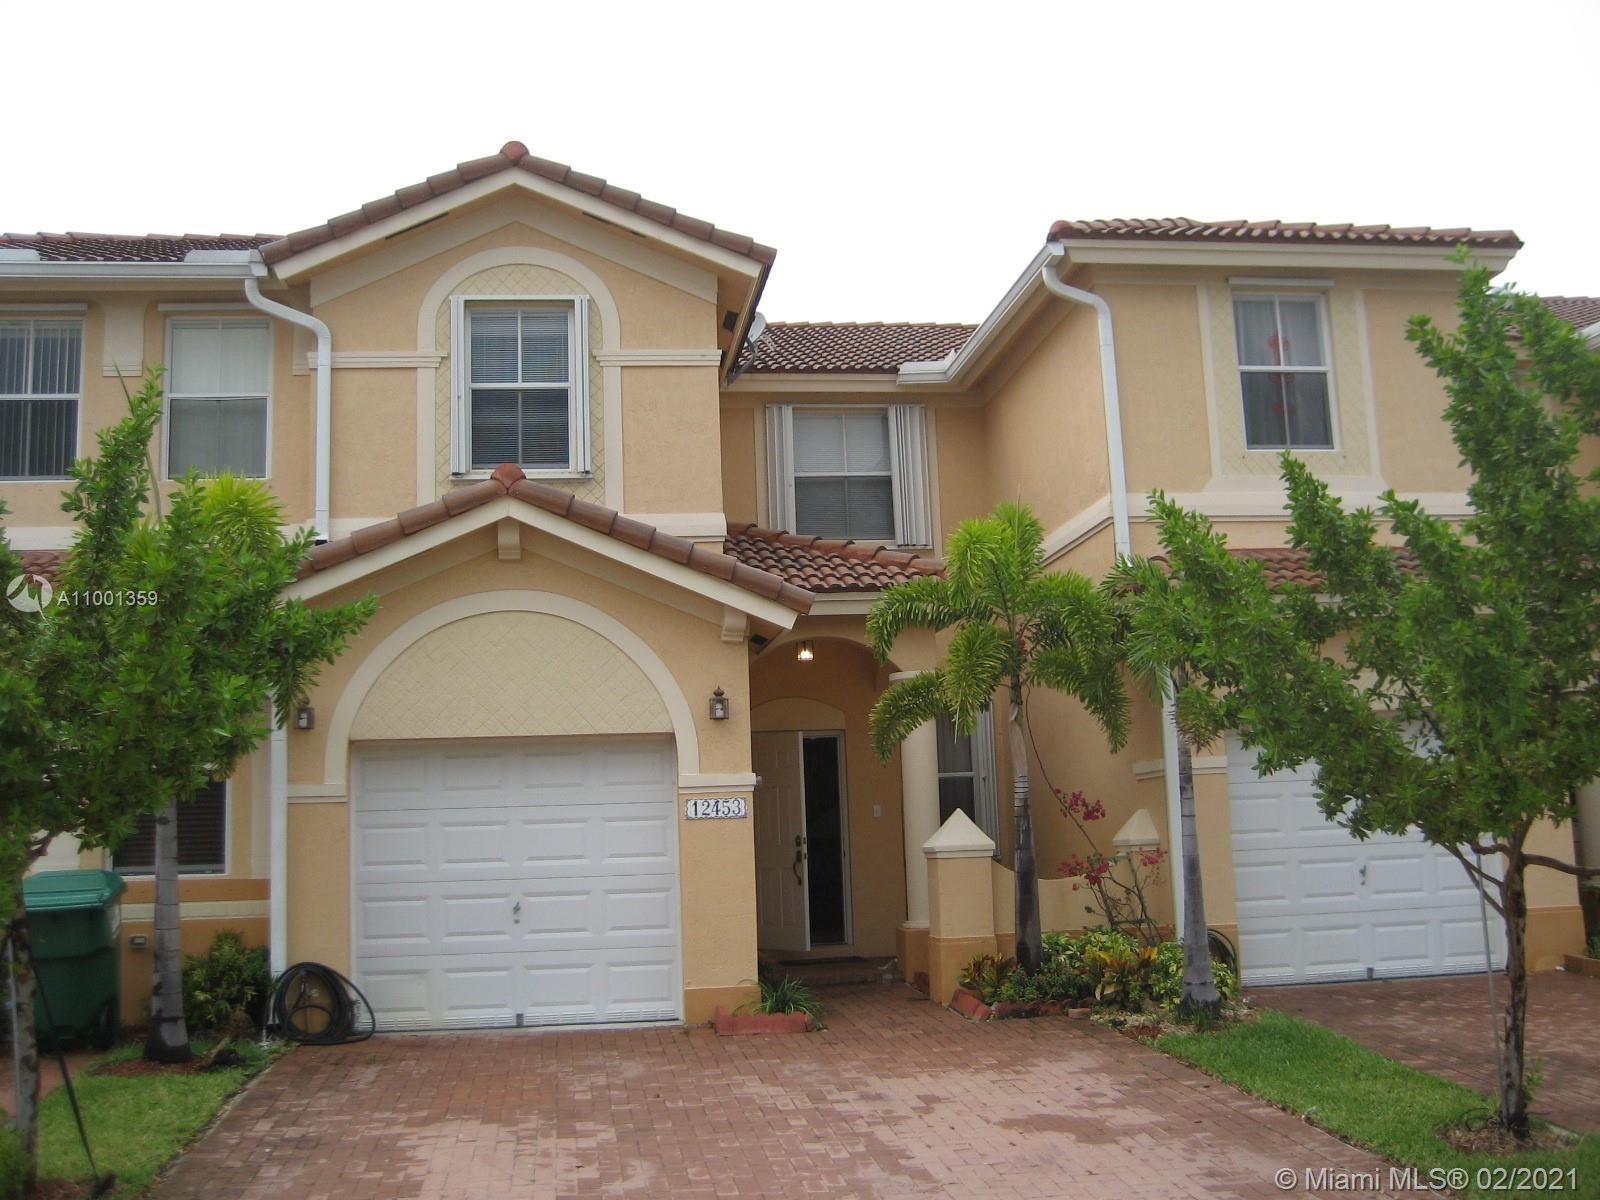 12453 SW 125 TE, Miami, FL 33186 - #: A11001359